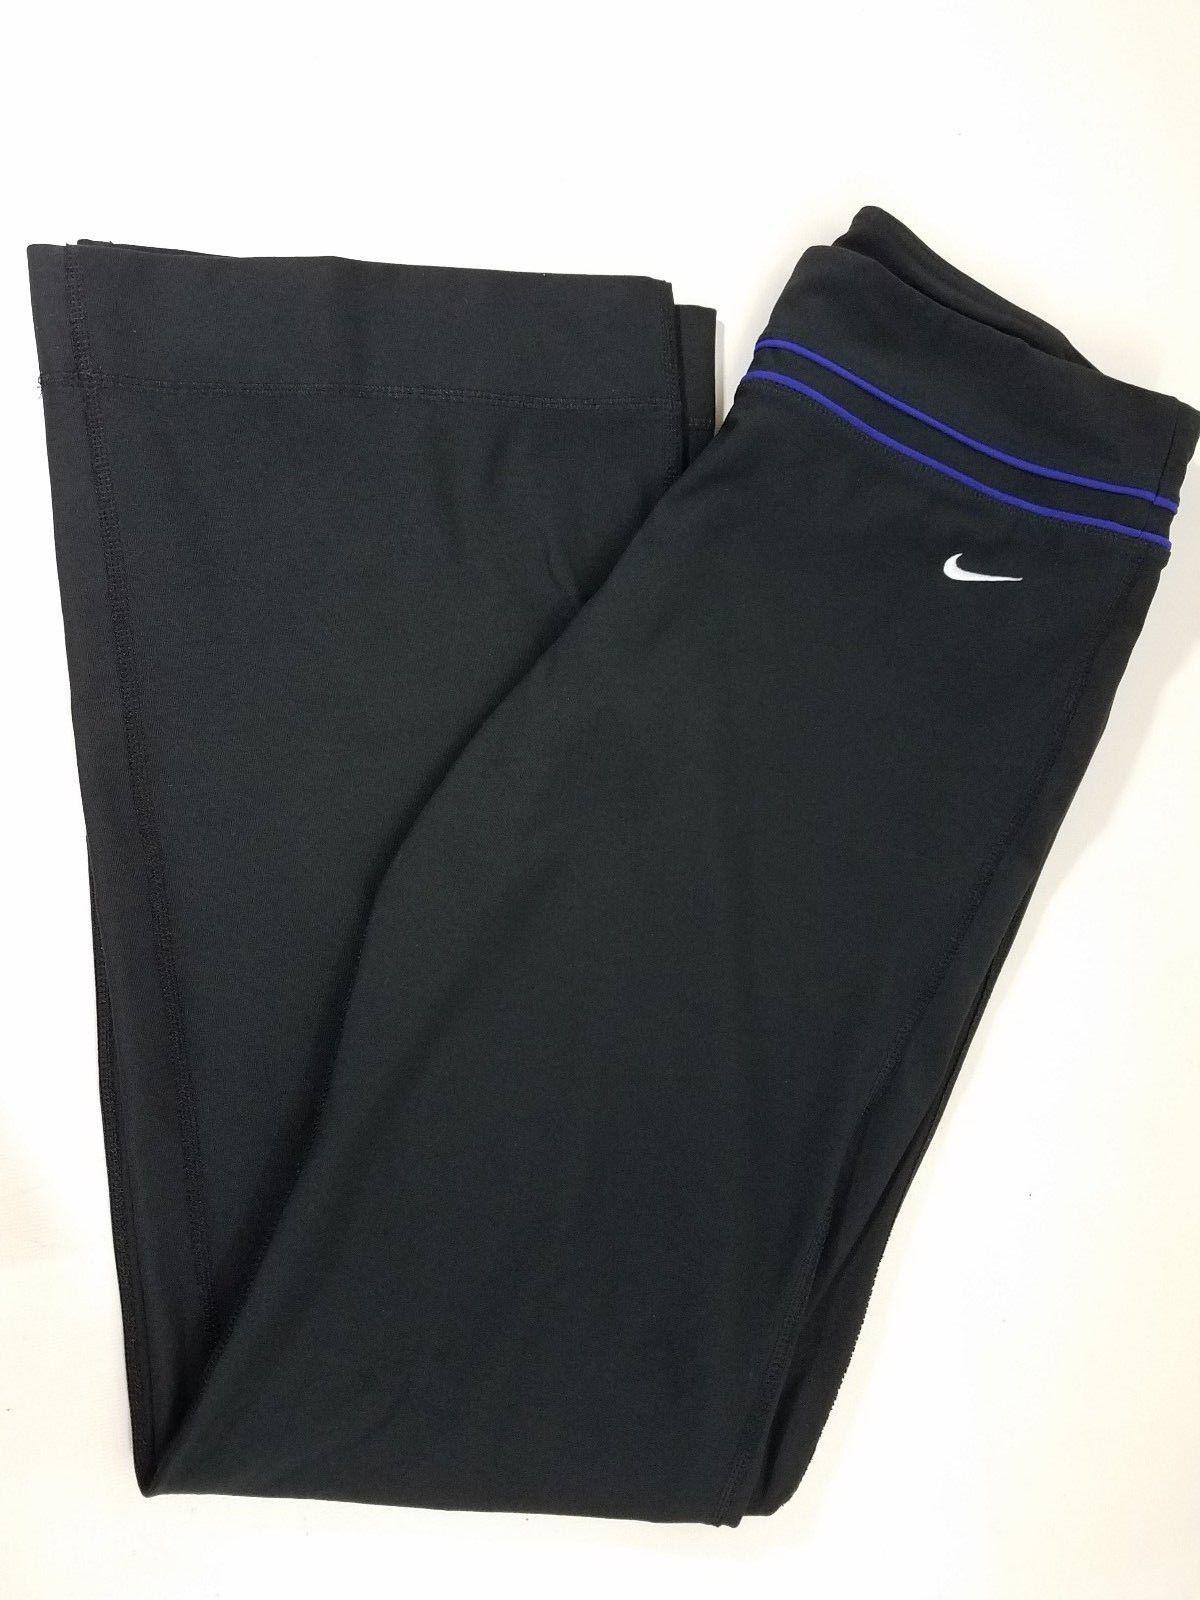 detailed look 52da6 352b2 S l1600. S l1600. Womens Nike Dri Fit Active Wear Workout Yoga Pants Black  Medium Poly Spandex